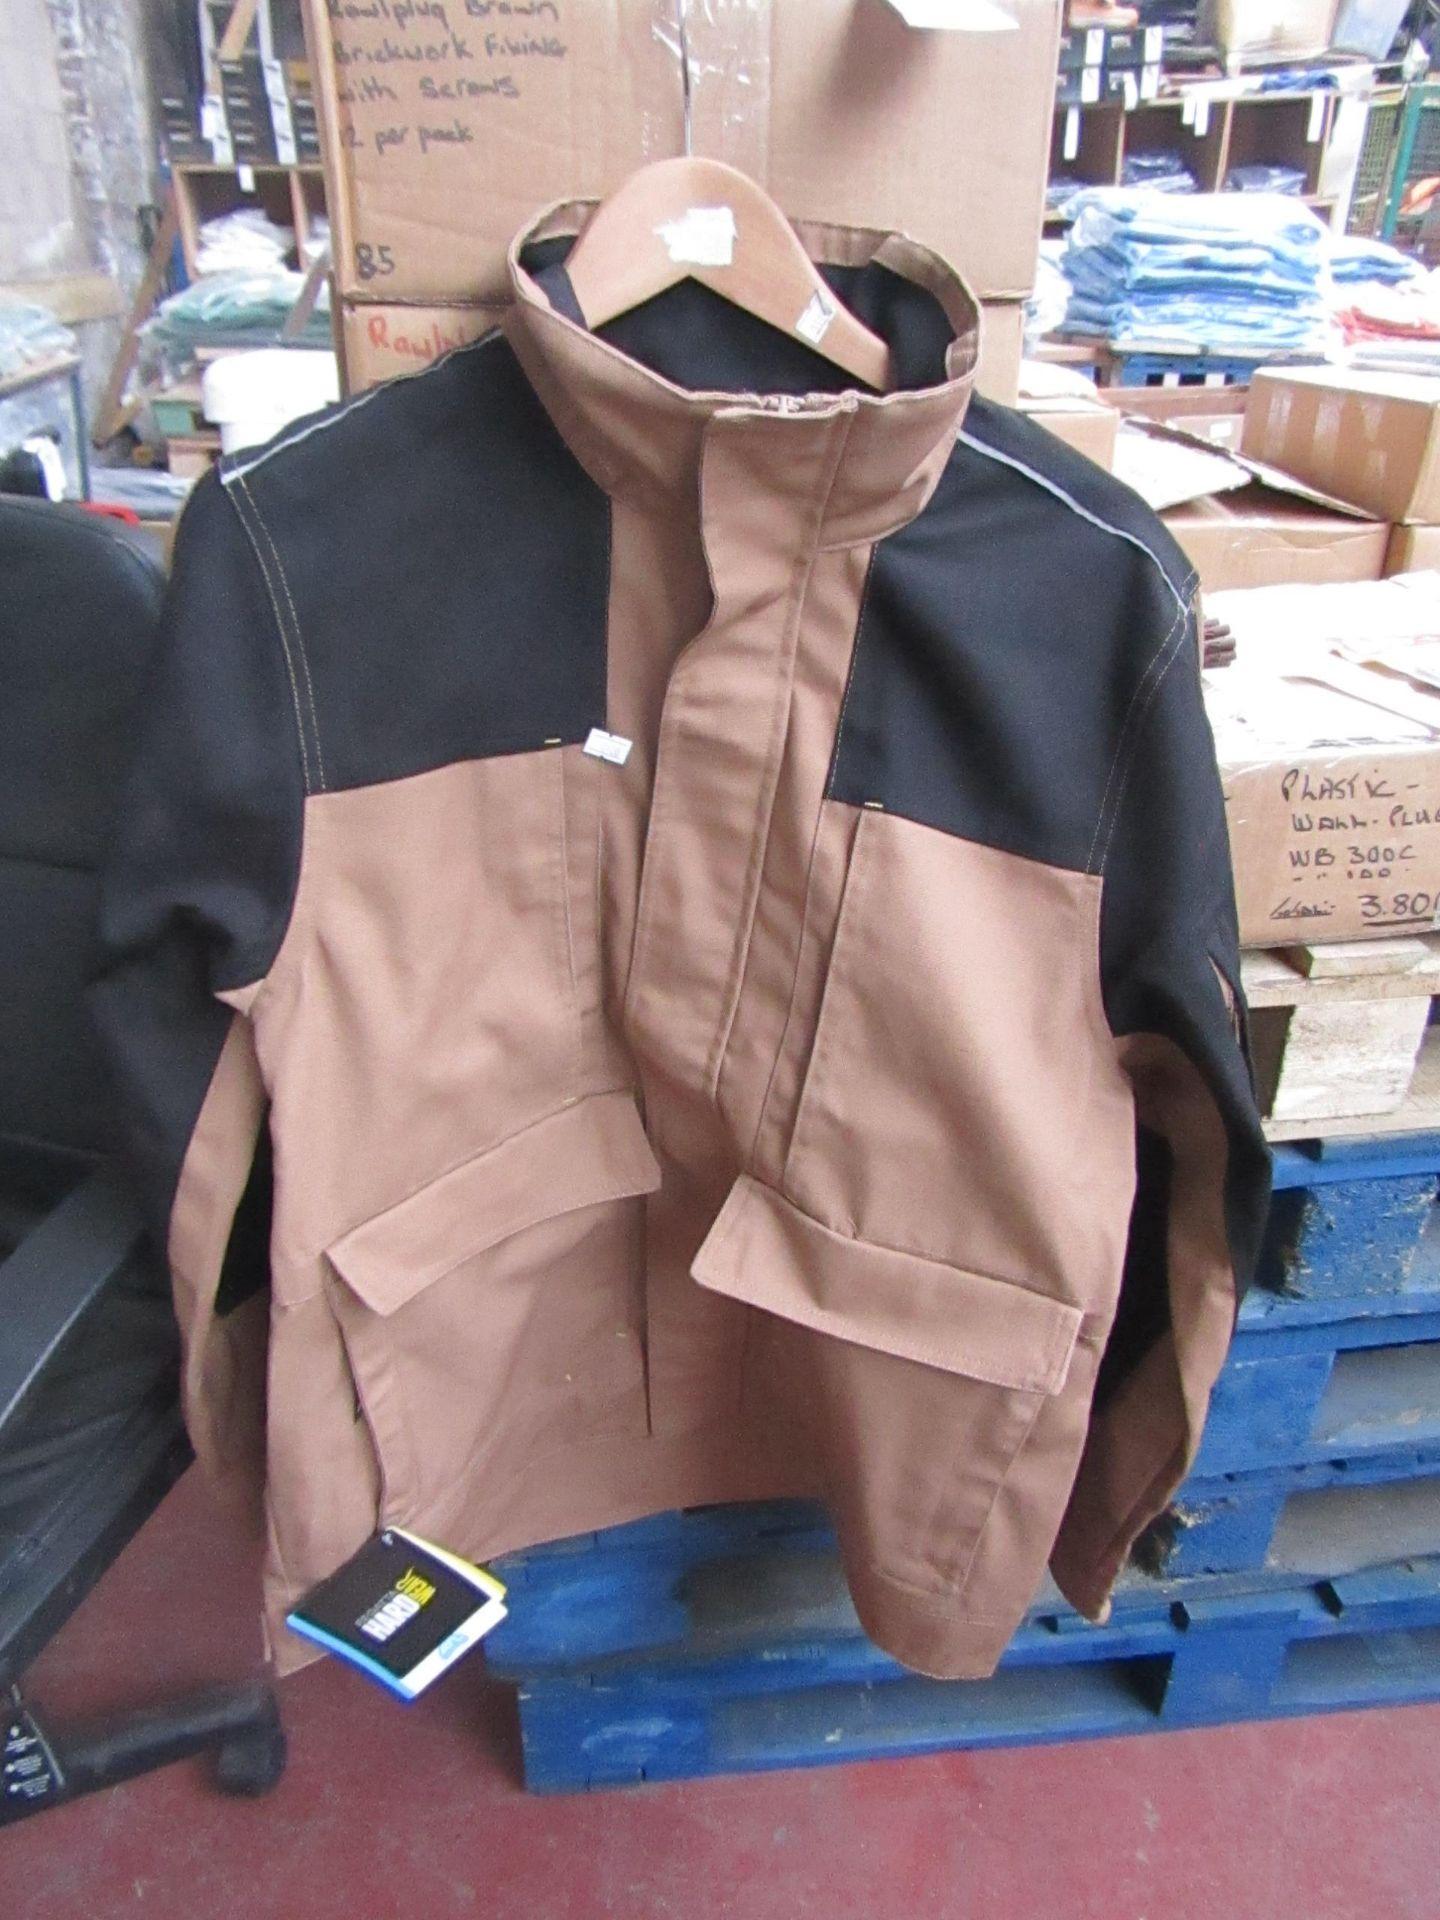 Lot 48 - Regatta Hard wear Jacket Size S, New with Tags